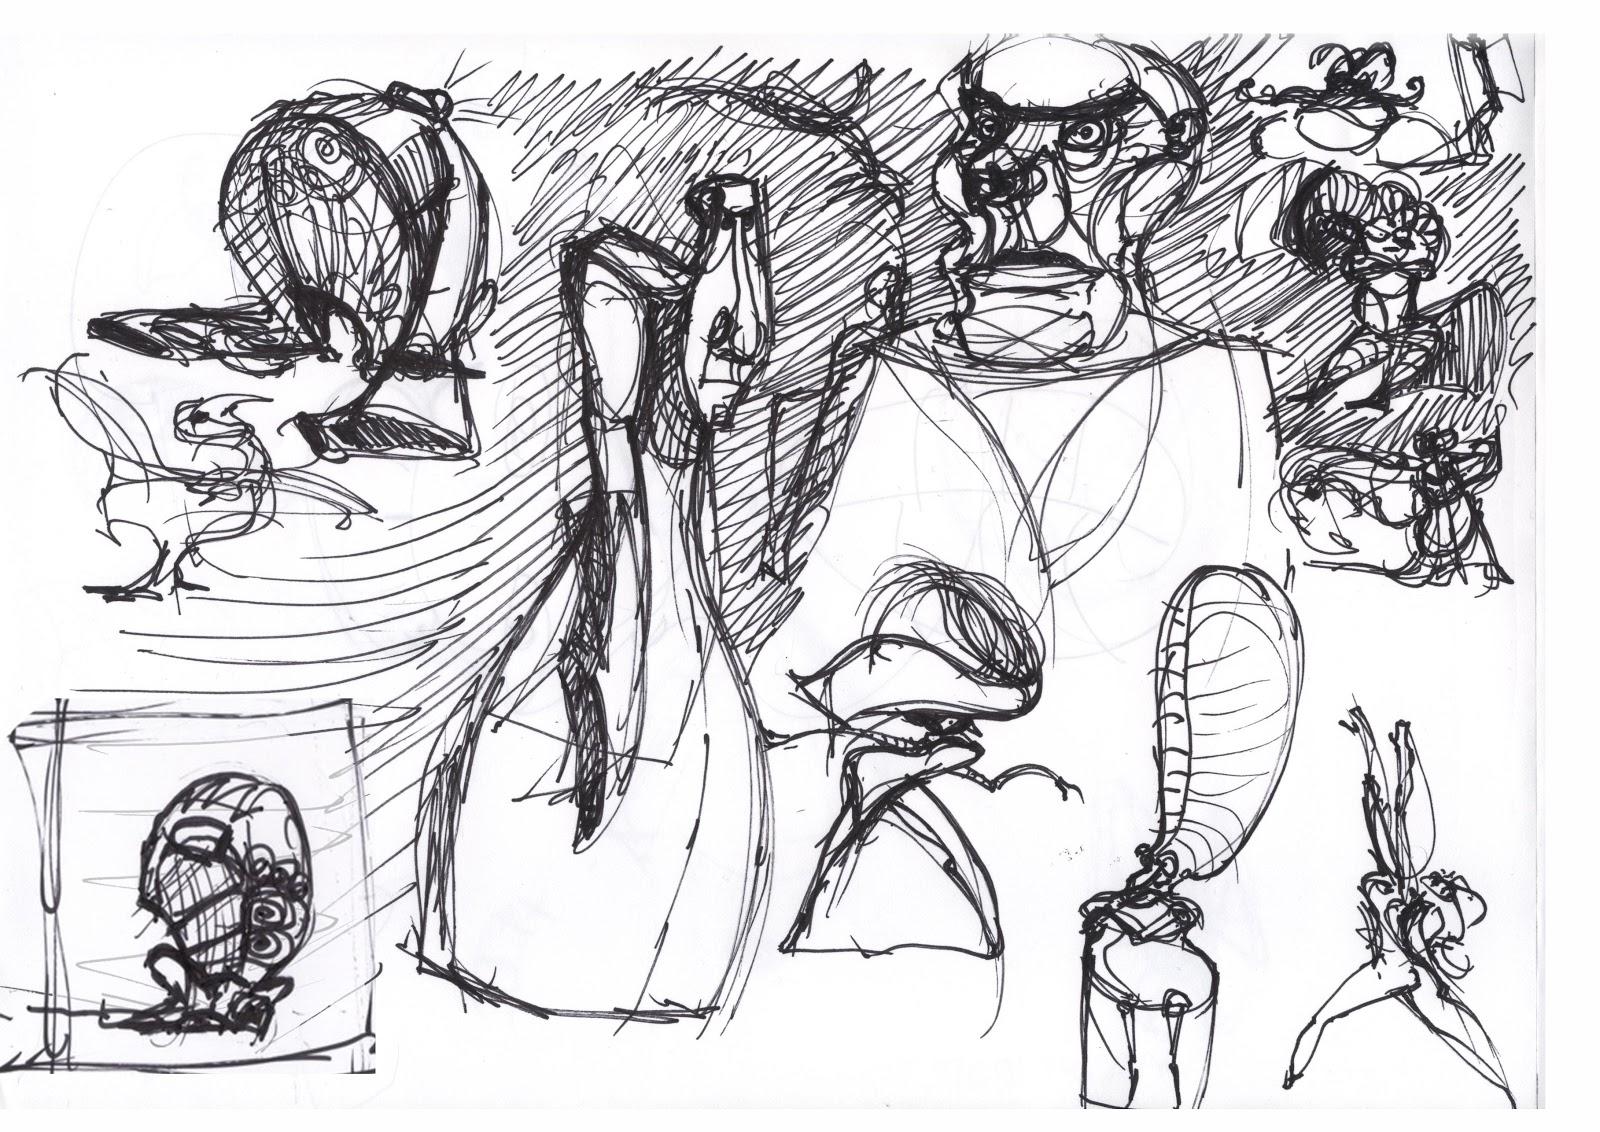 Yolantele October S Sketchbook